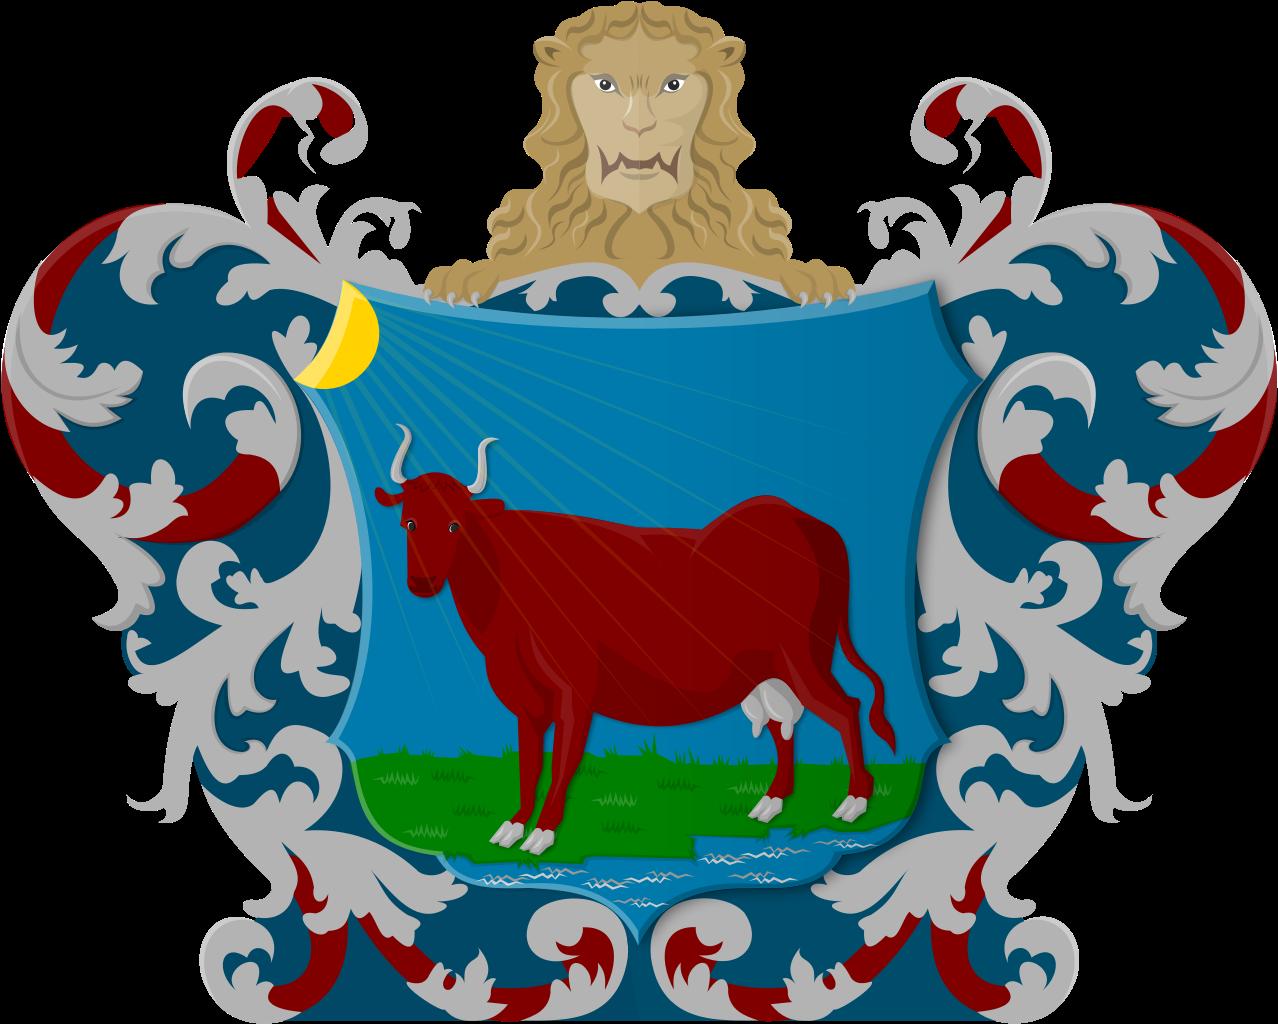 File:Beemster wapen 1612.svg.